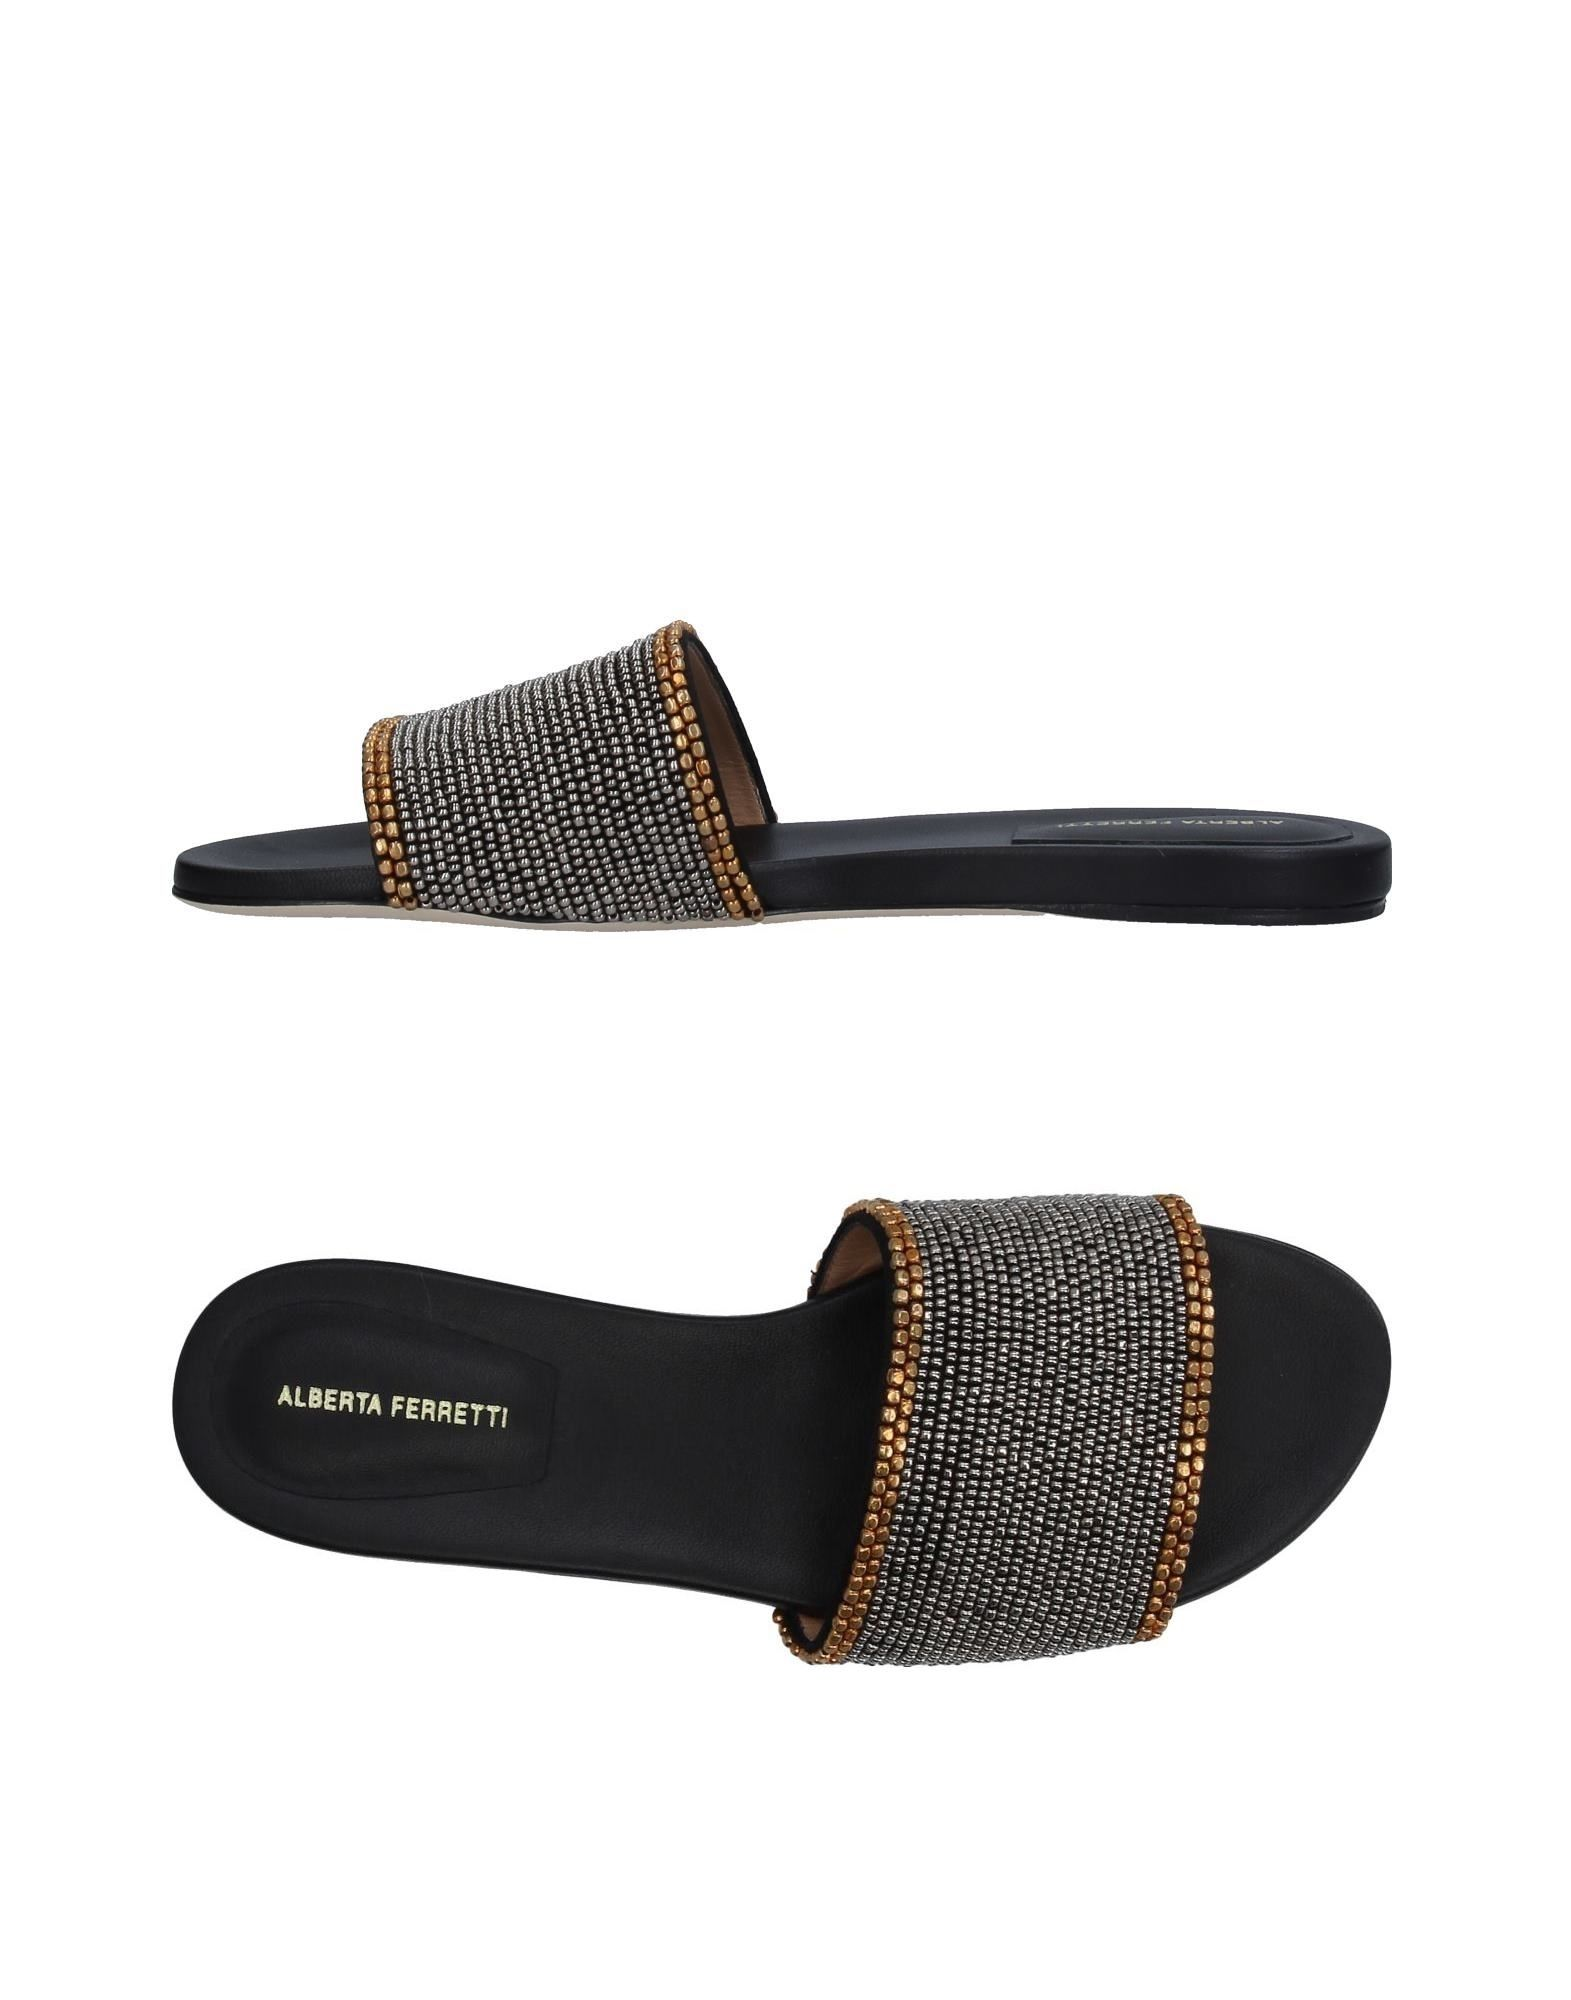 Alberta Ferretti Sandalen Damen  11326926RV Schuhe Neue Schuhe 11326926RV 143797